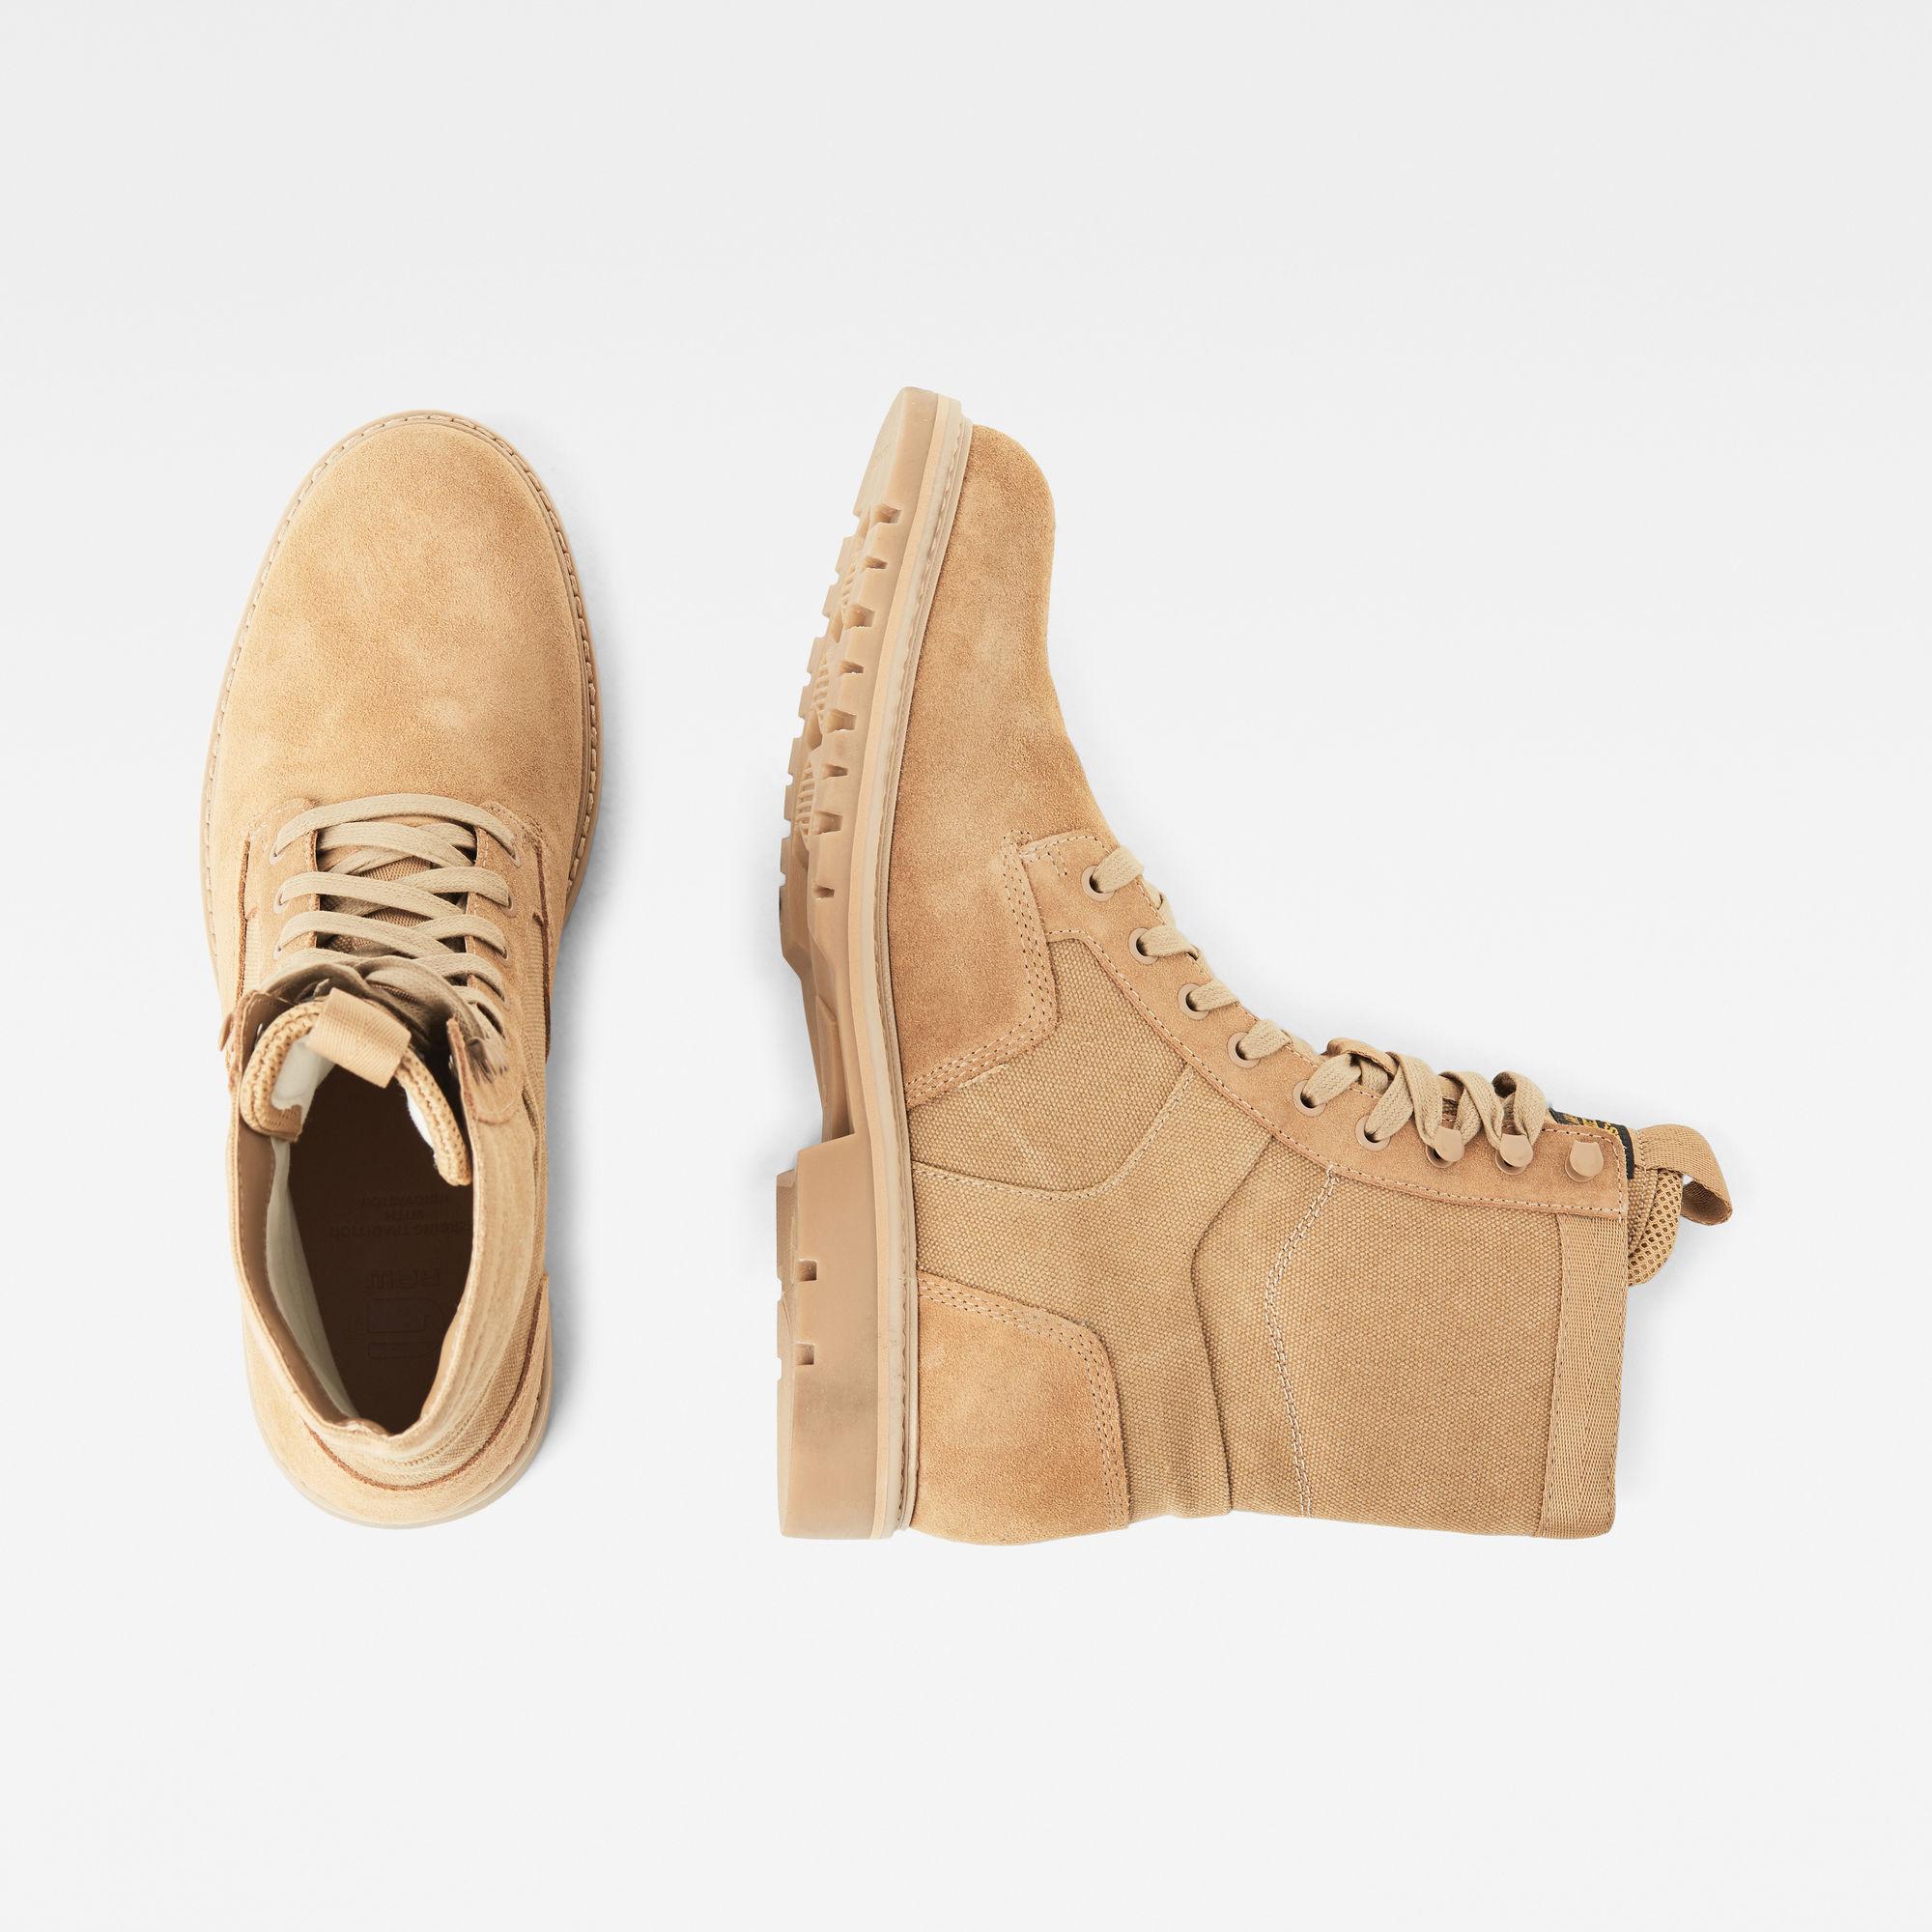 Tendric Boots II